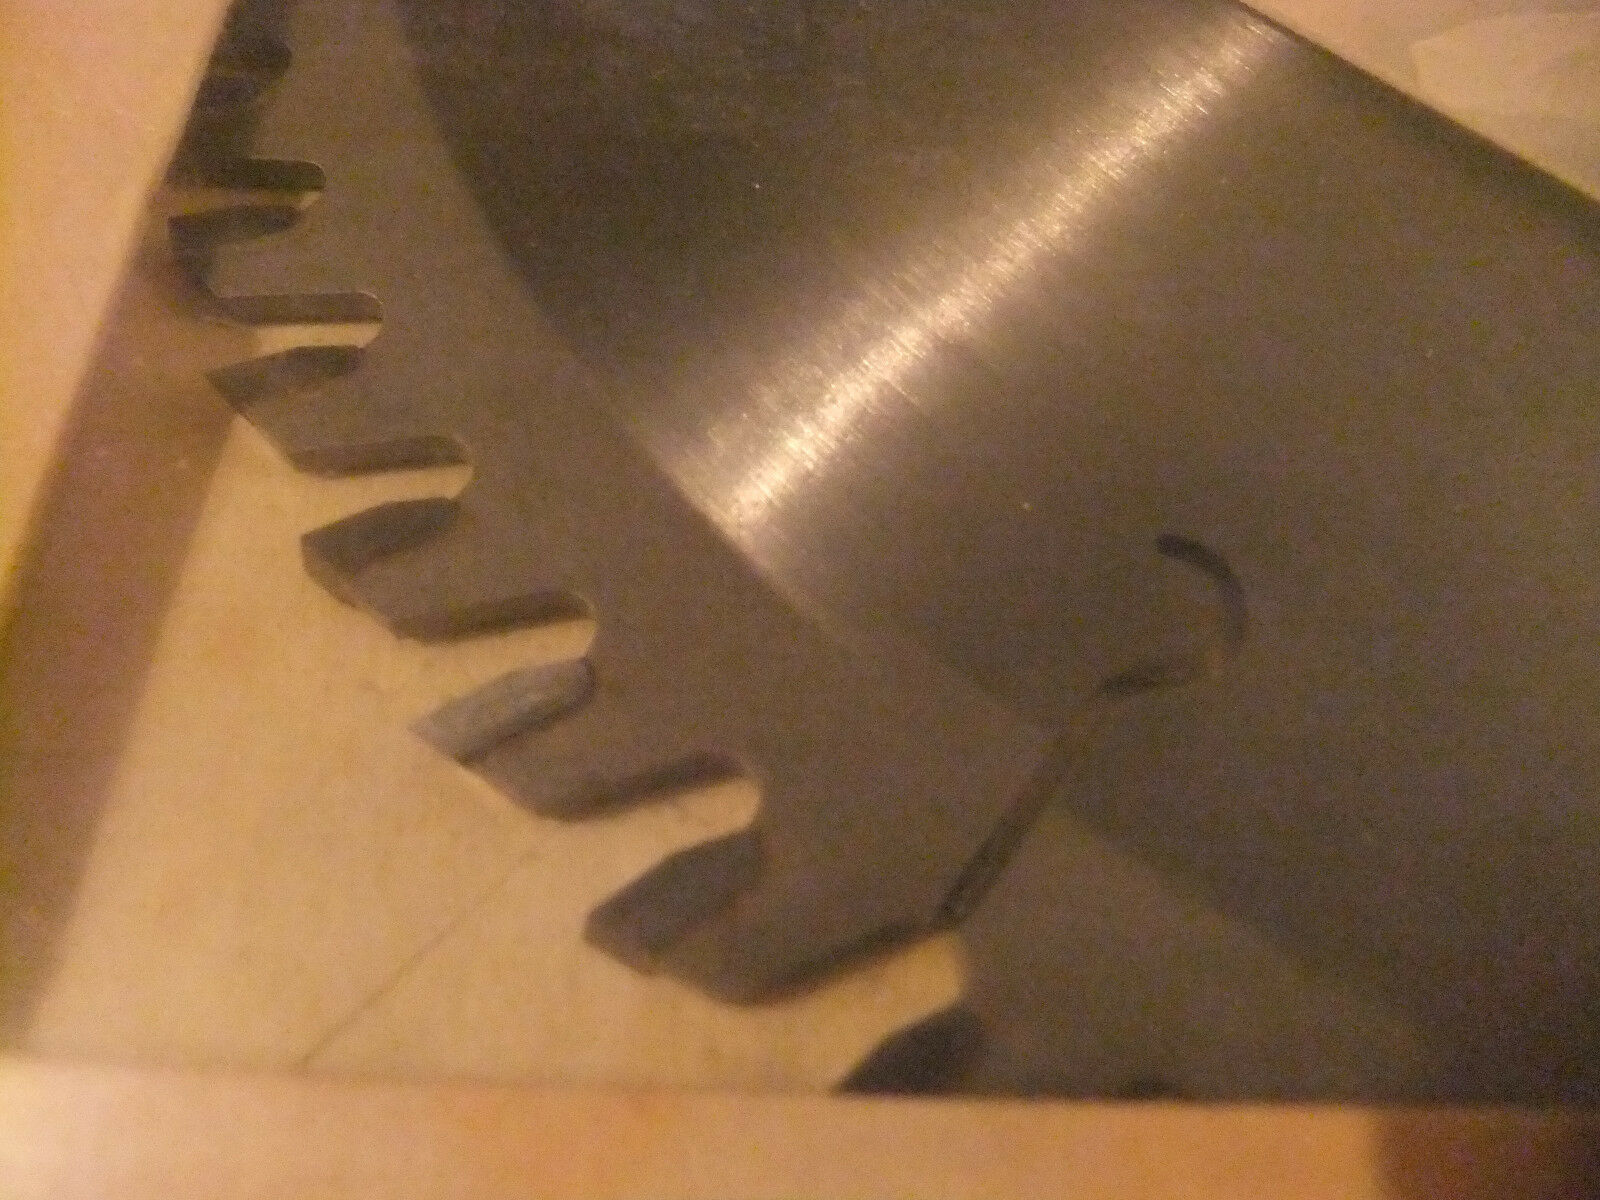 Stehle 230mm x 64 ATB x 30mm TCT wood wood wood cutting saw blade. Holzher 2118 2120 8284a6